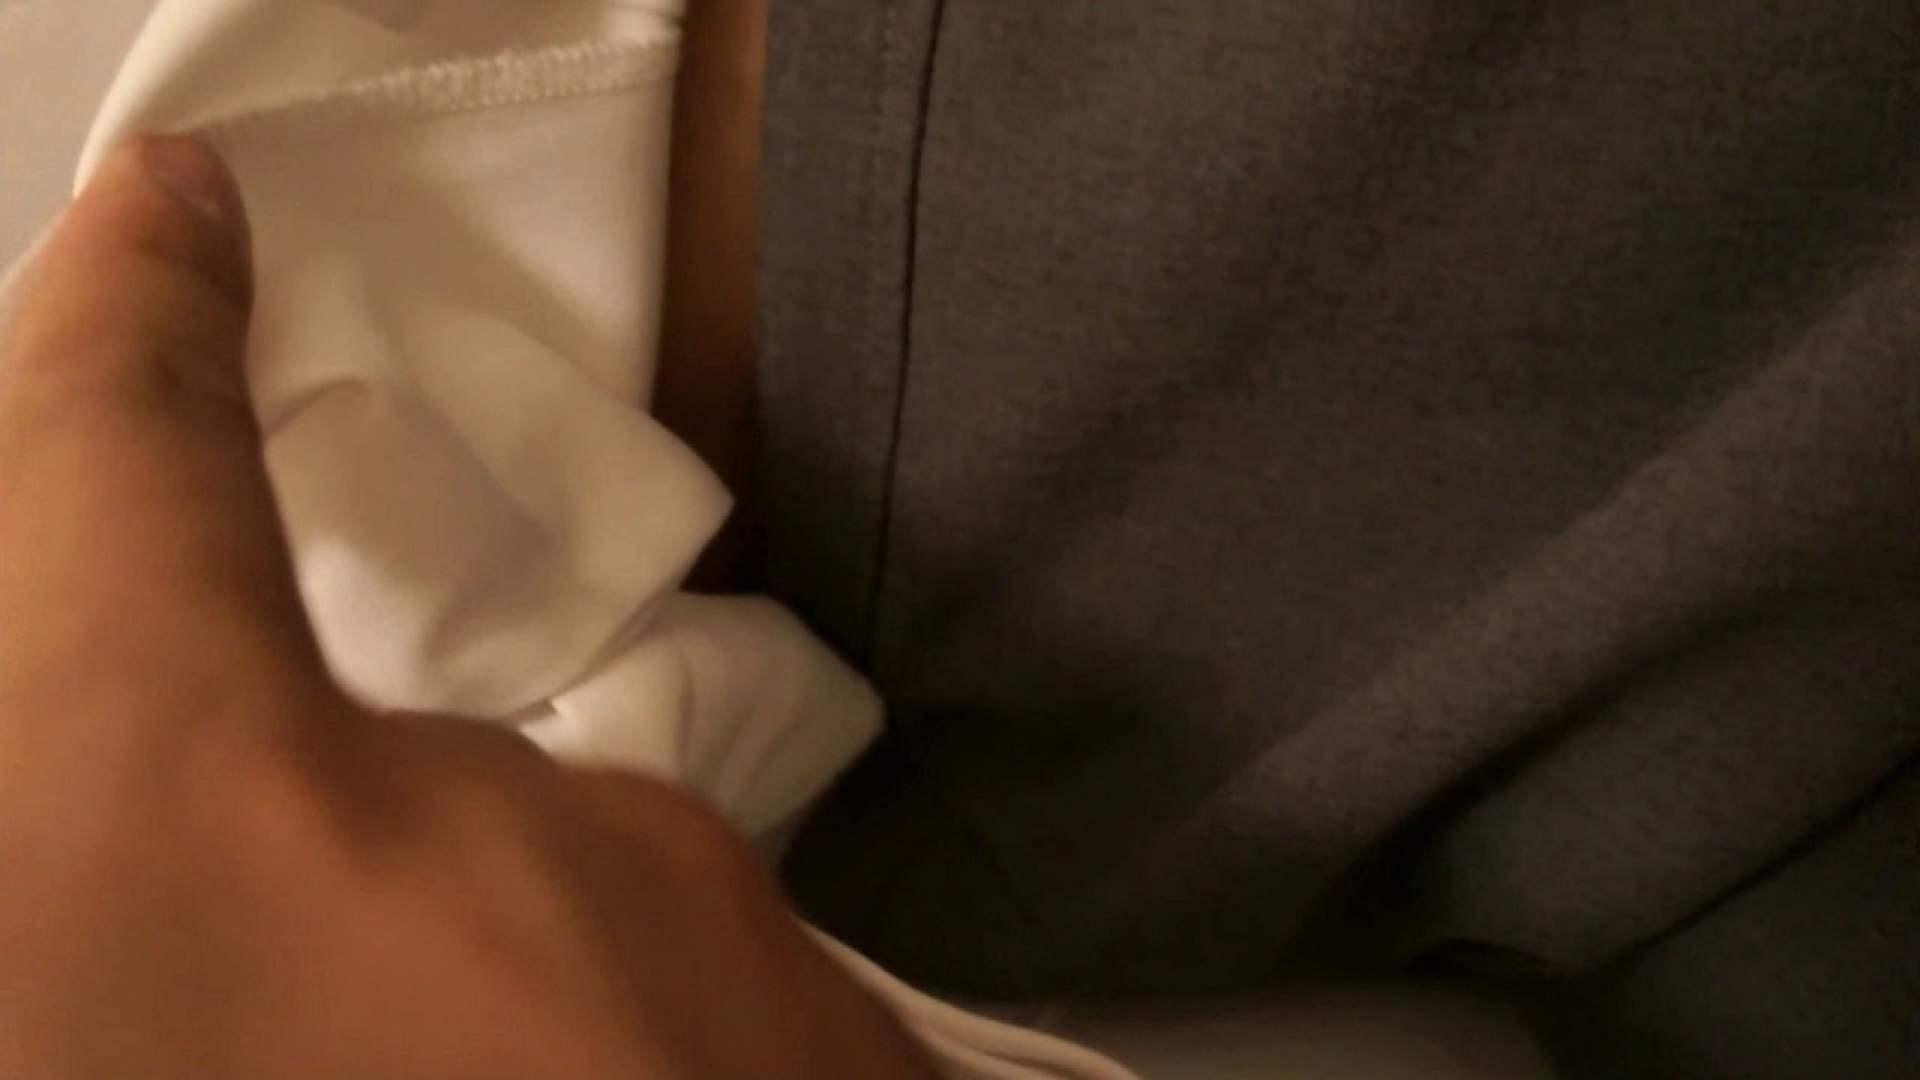 vol.8 【Mちゃん(2回目)】ブランド品査定士19歳 花子とも仲良し イタズラ特集   ギャル盗撮映像  89PIX 43